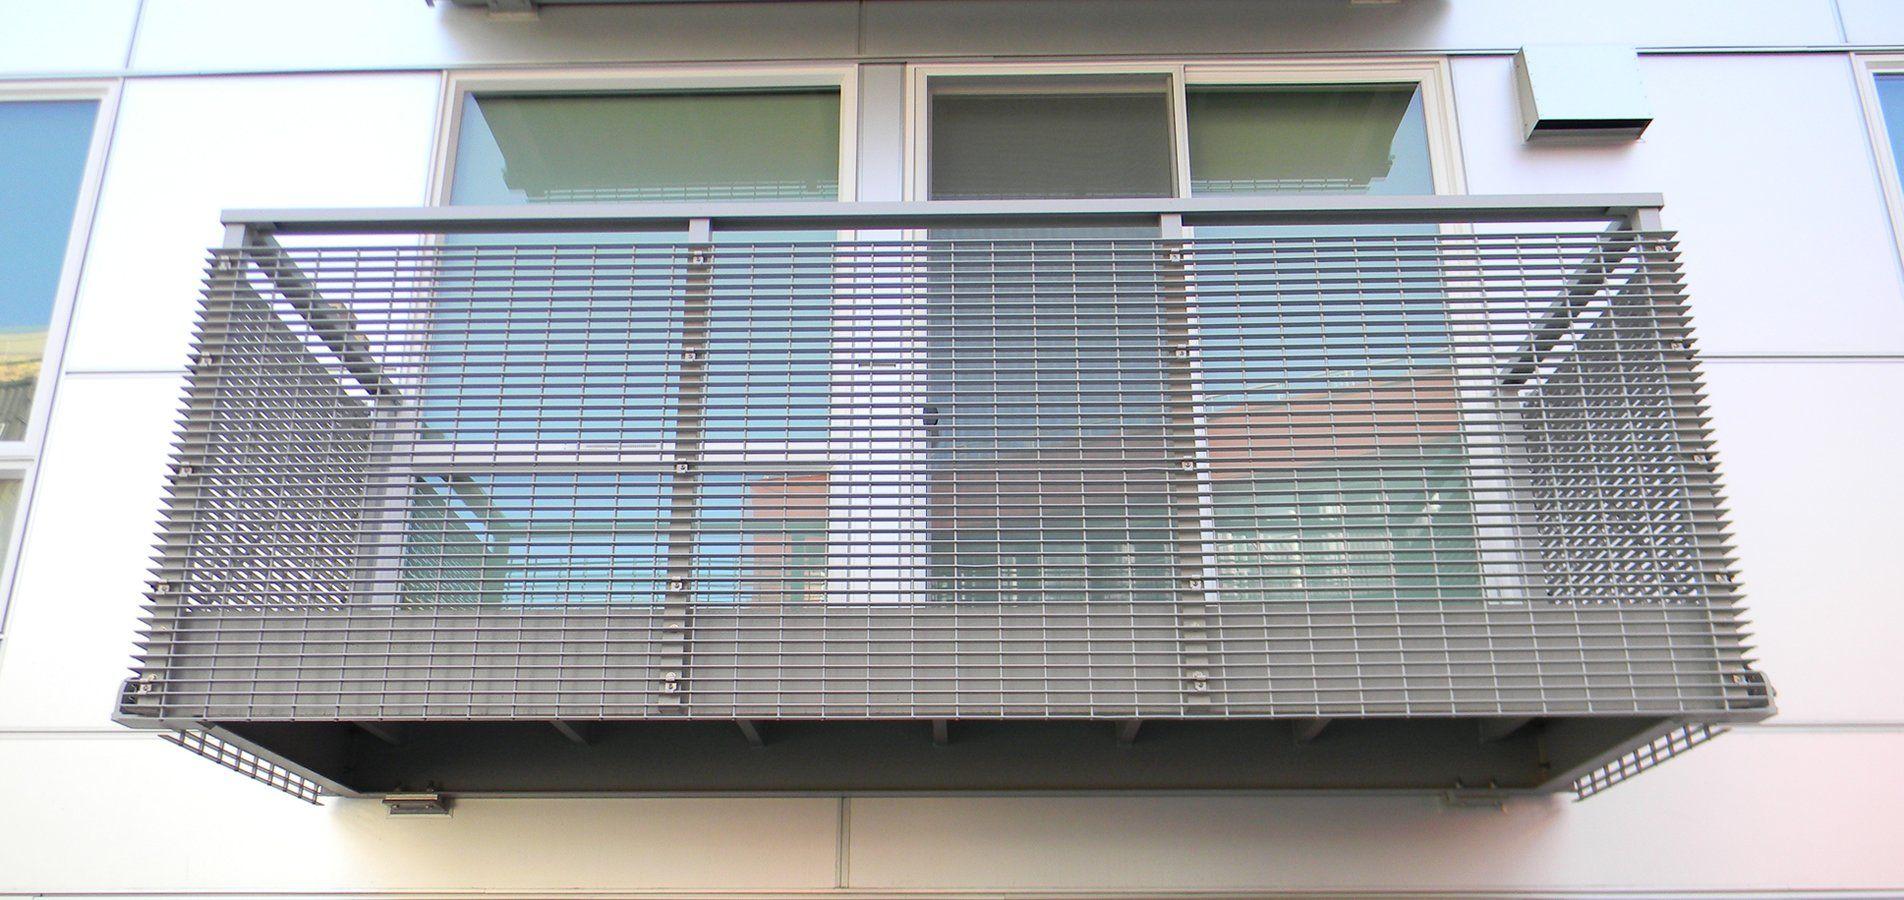 Perforated Mesh Panels Grating Privacy Screens Fencing Metal Fabricated Arquitectura Casa Del Arbol Rejilla Irving